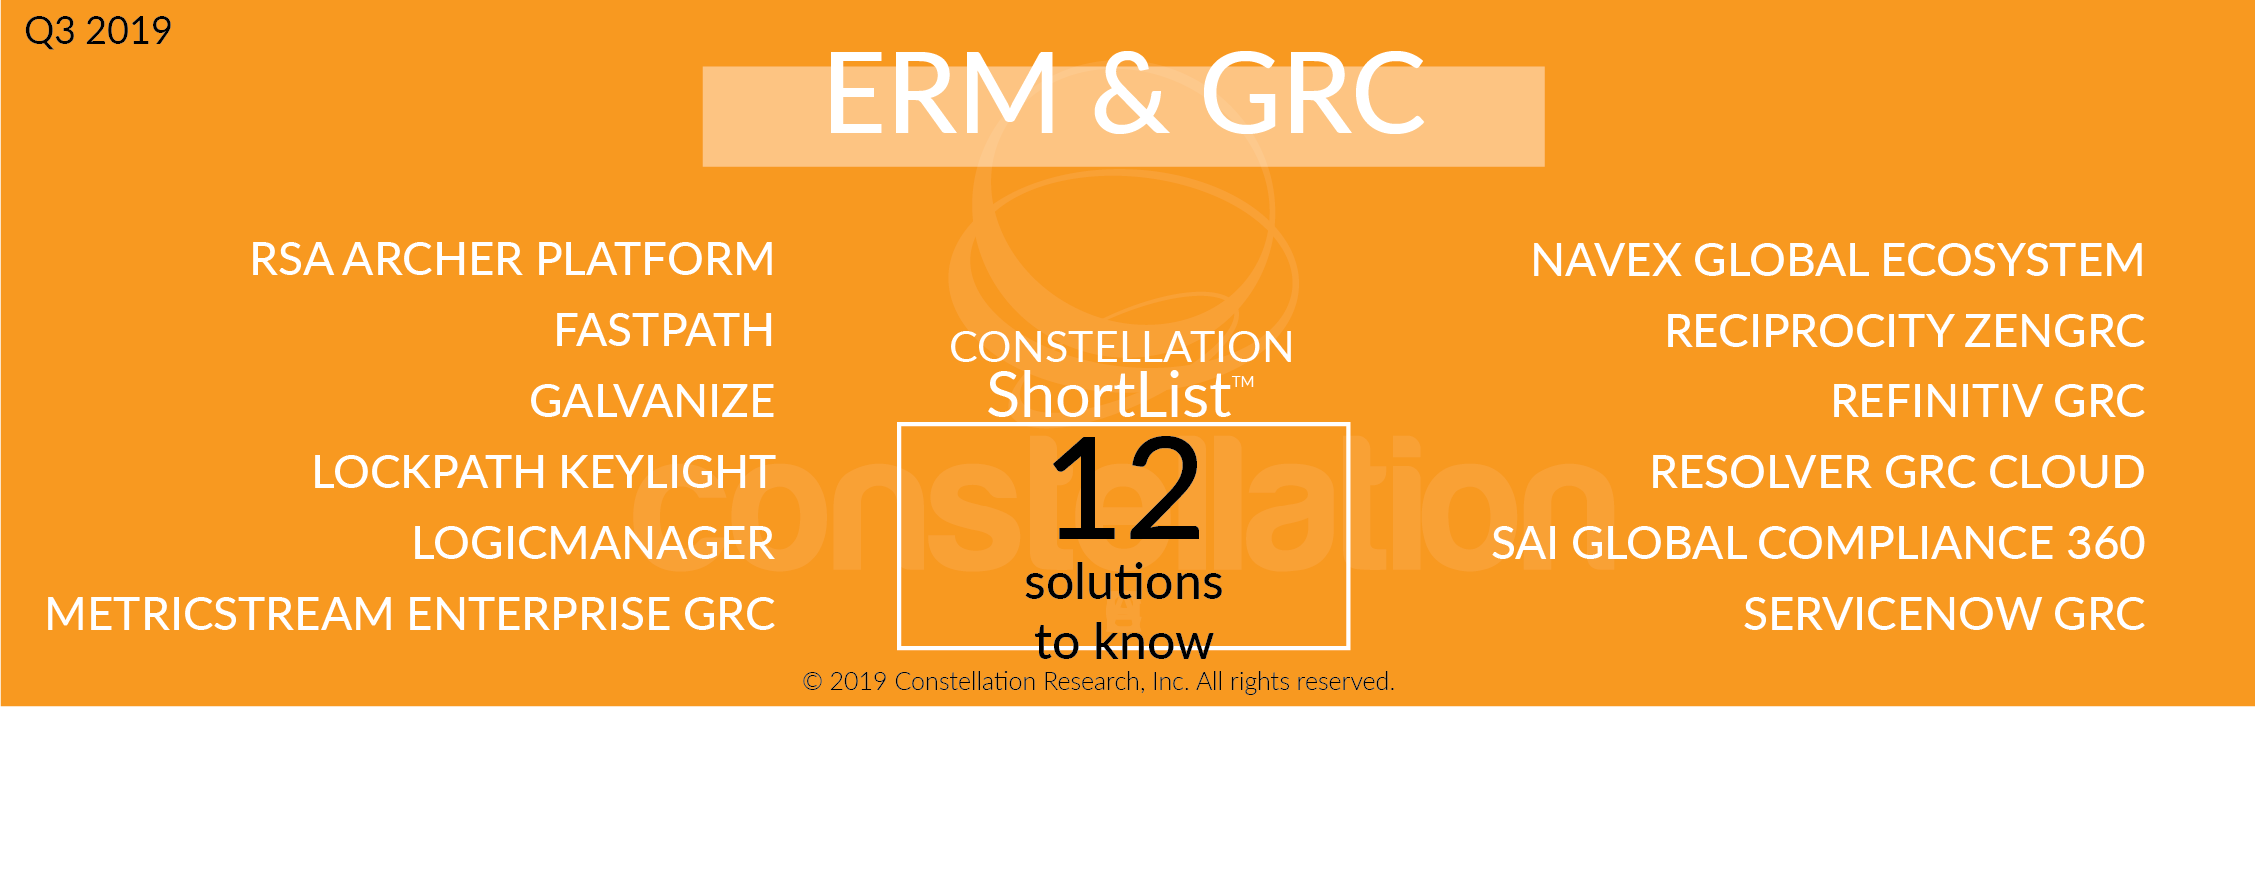 Constellation ShortList™ Enterprise Low-Code Tools and Platforms